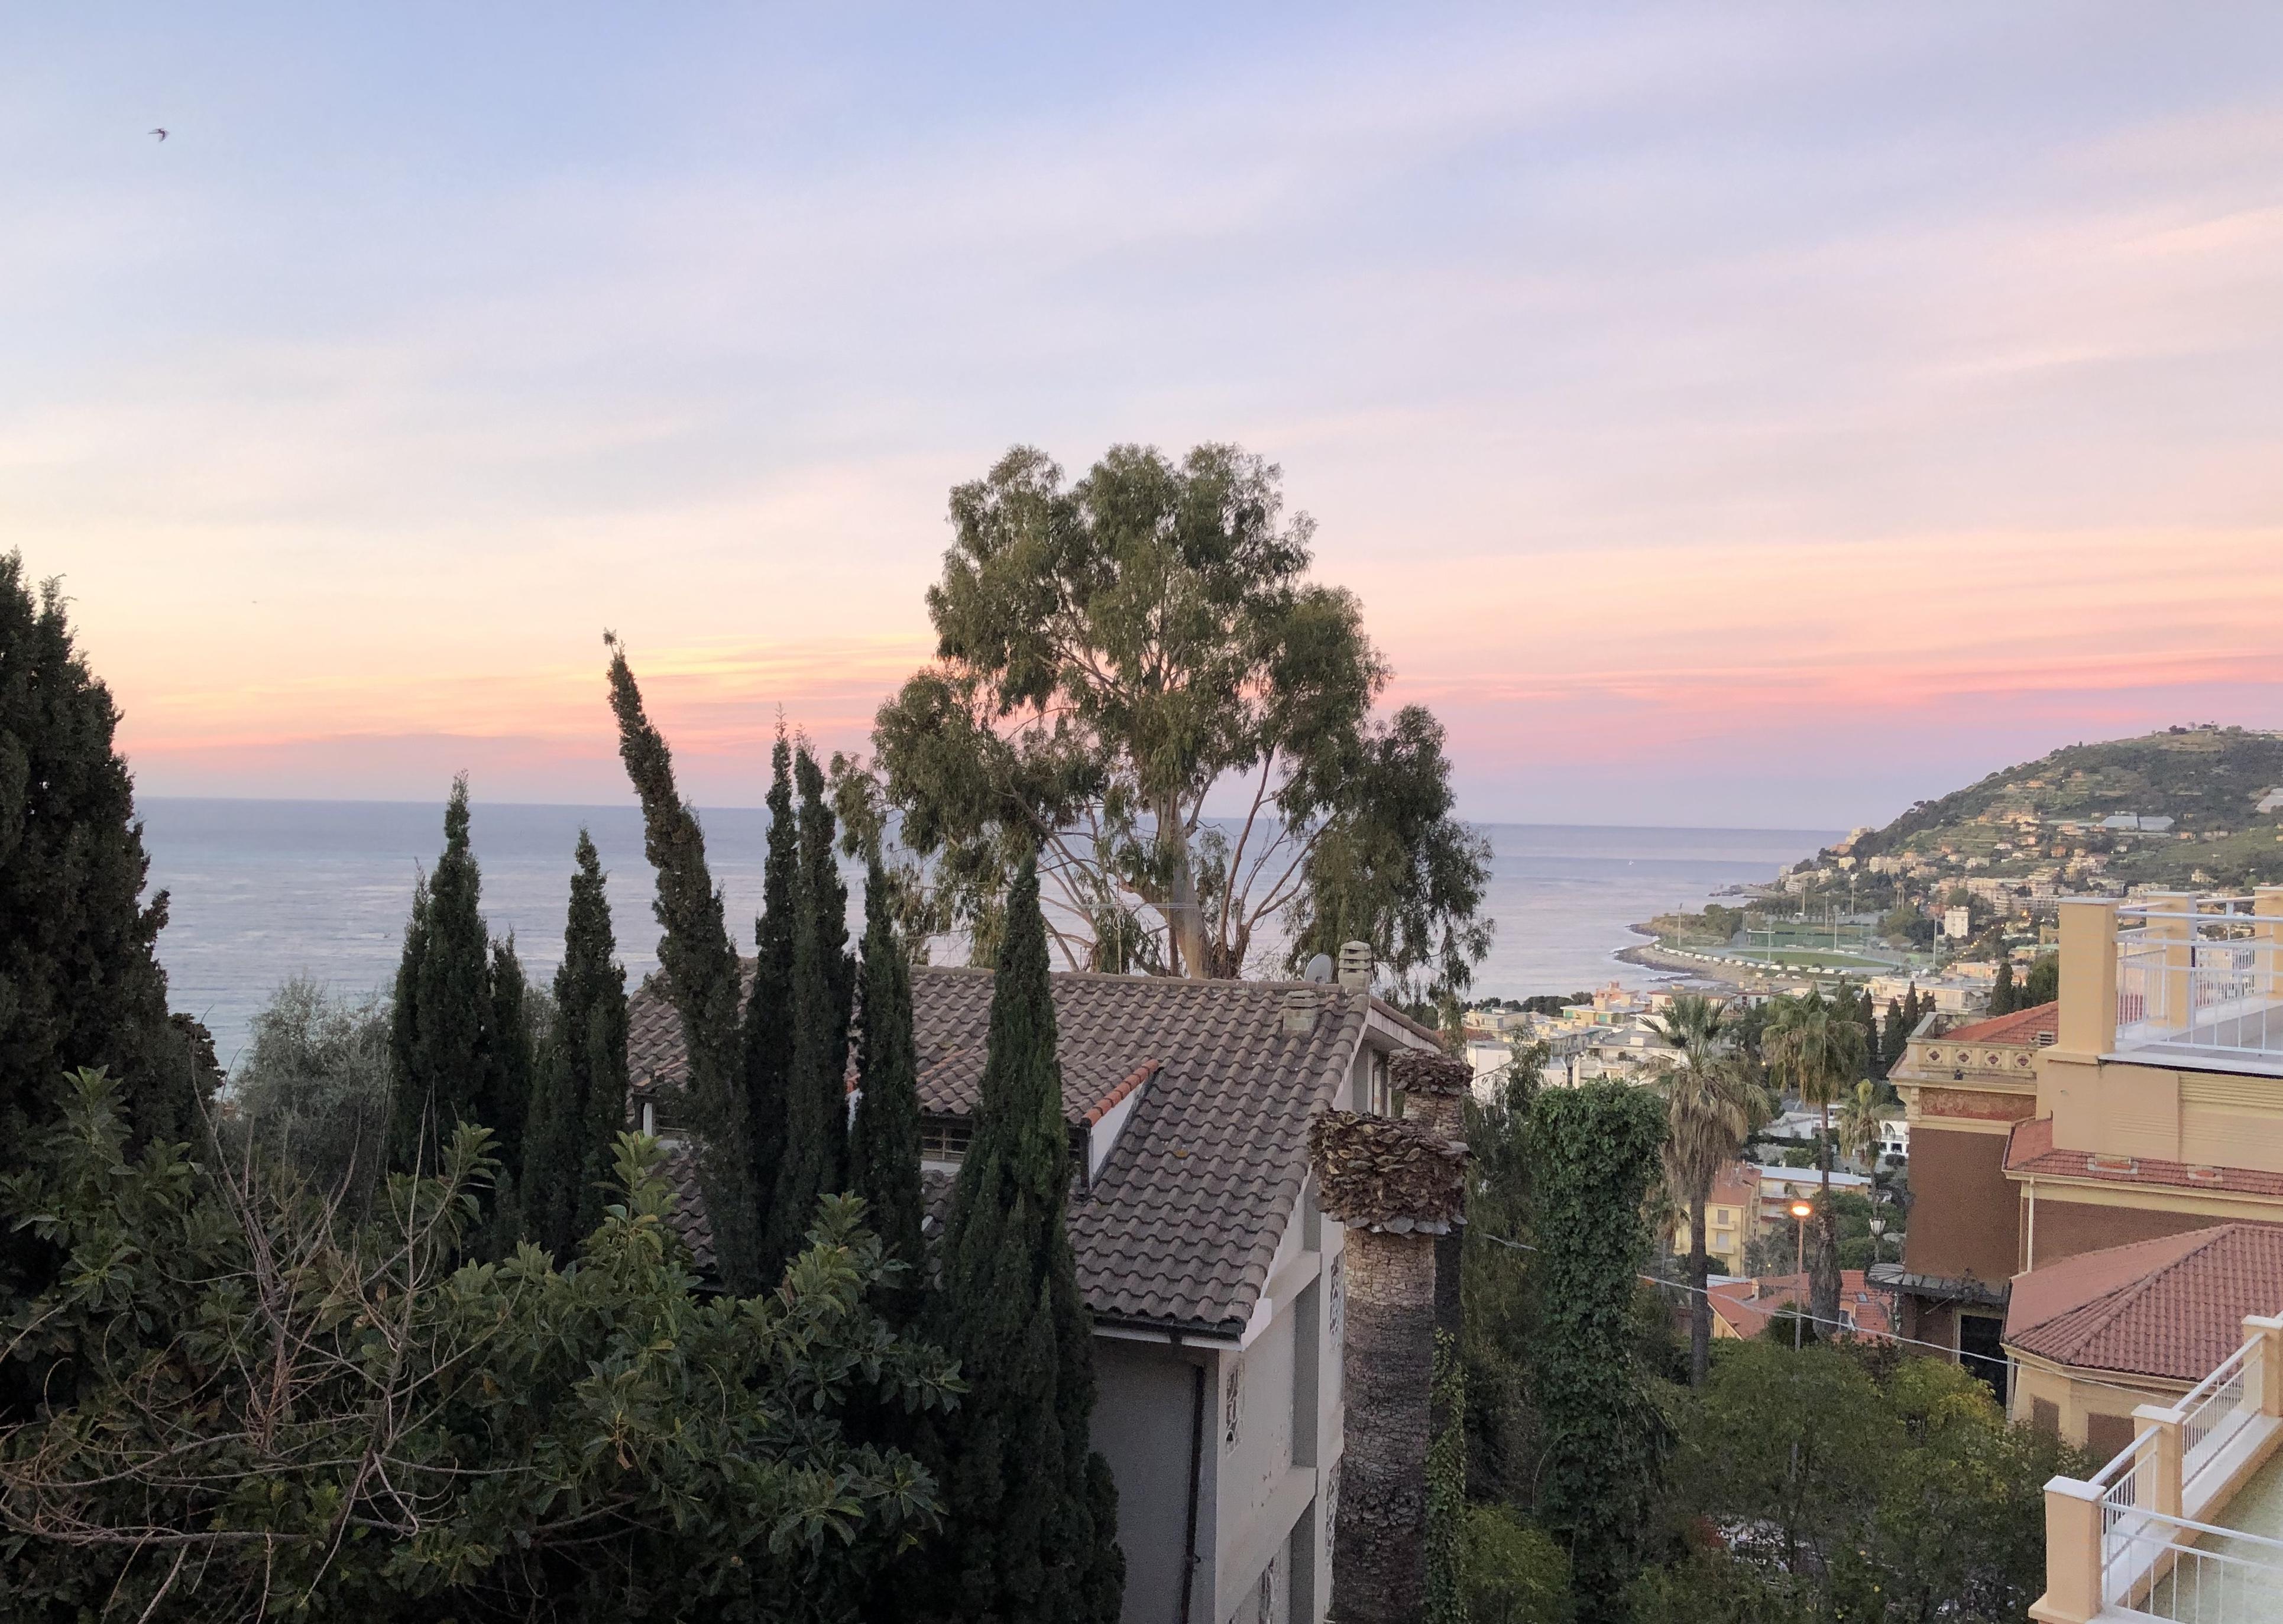 Sonnenuntergang in Sanremo